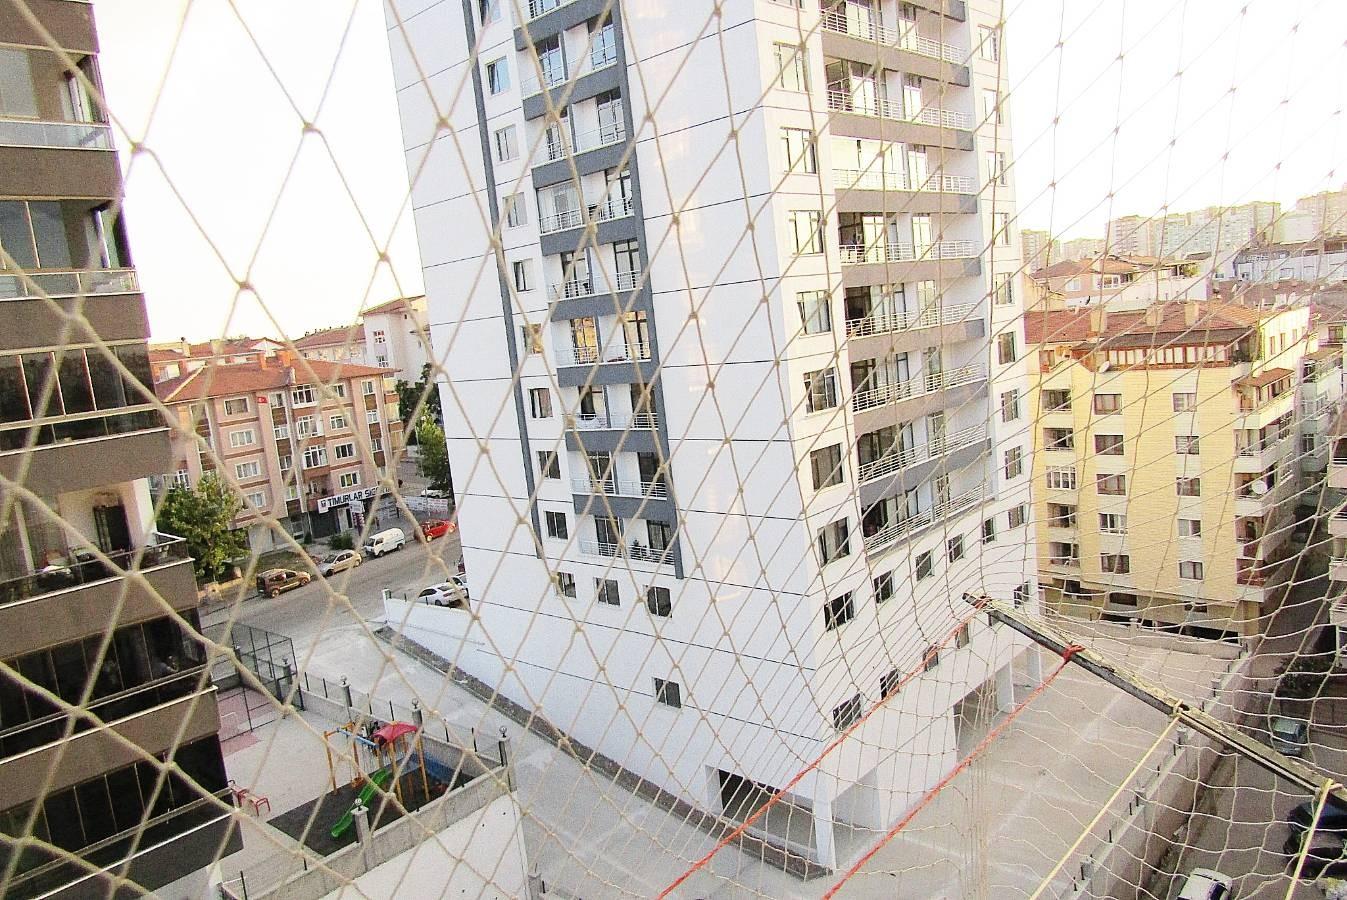 SR EMLAK'TAN TOPÇU MAH'DE 3+1 110m² SİTE İÇİNDE MANZARALI ASANSÖRLÜ DAİRE